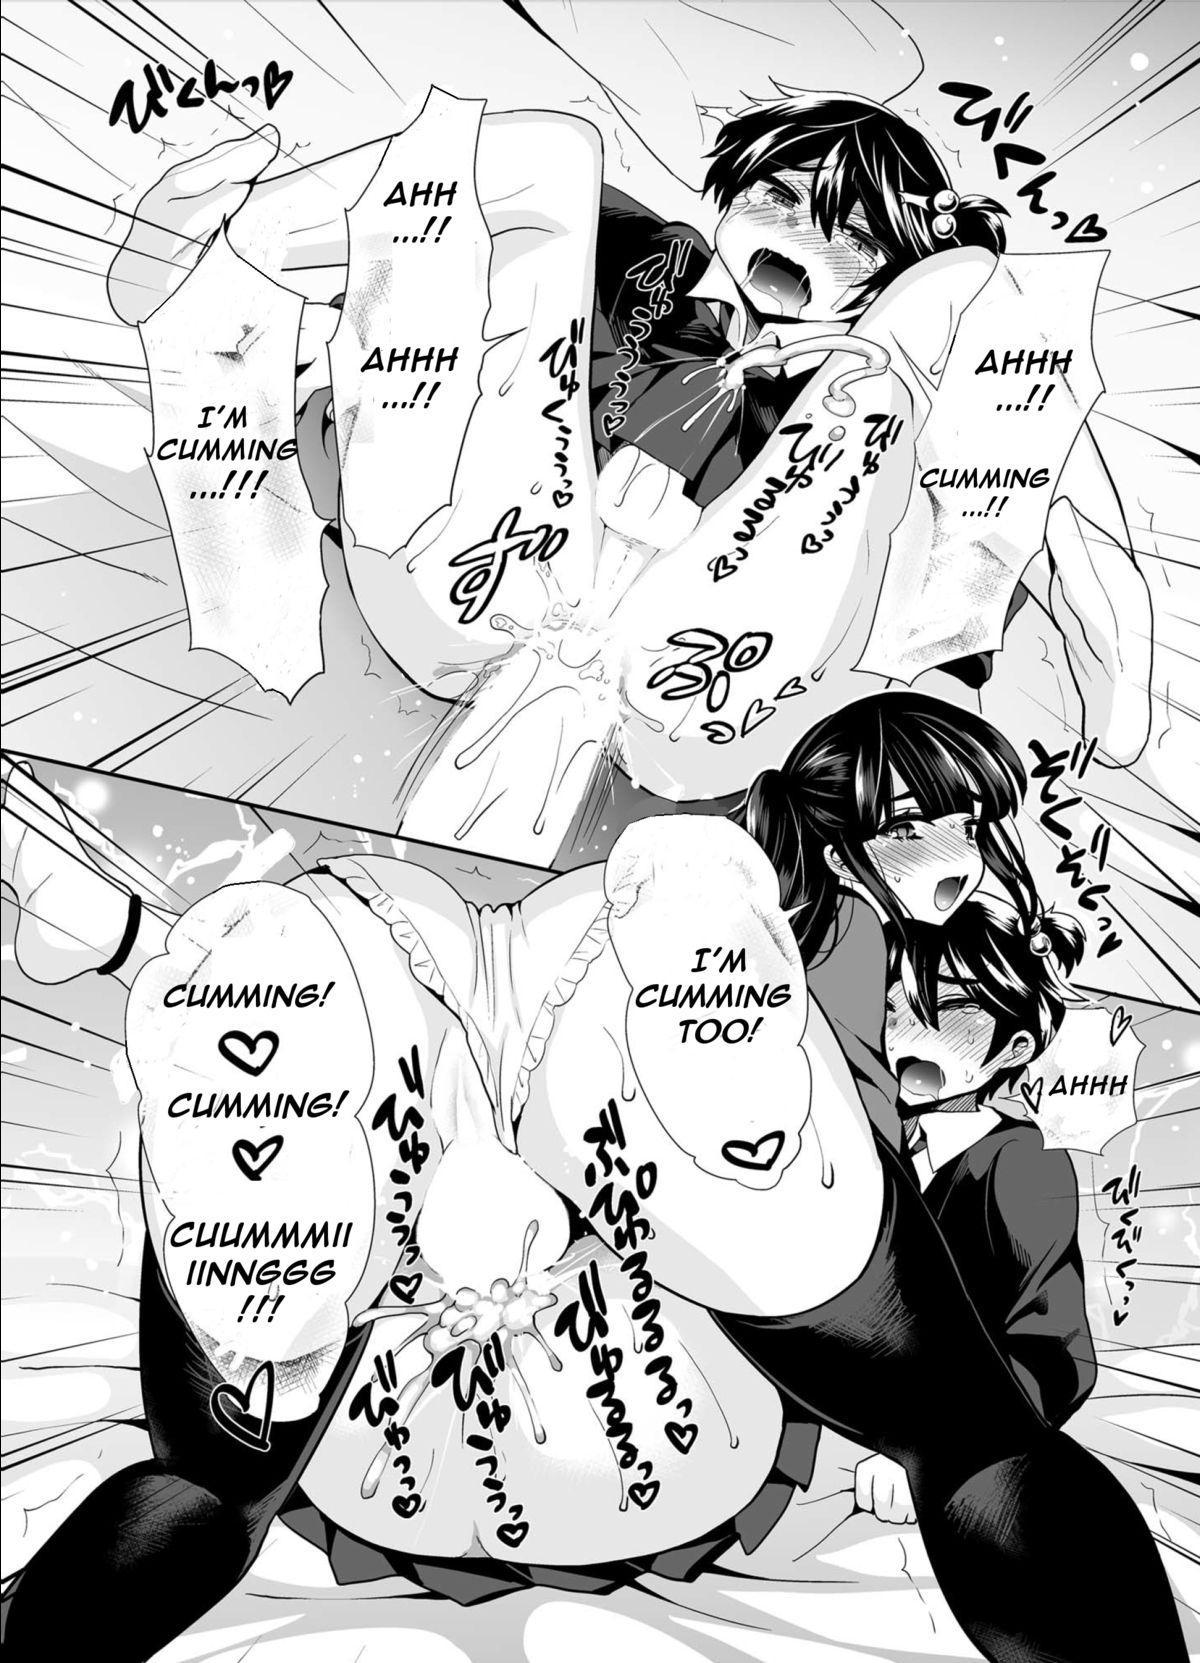 [Oshiruko Kan (Piririnegi)] Futanari! Oshioki Time 2 ~Shasei Kanri Kyousei Josou Hen~ | Futanari! Punishment Time 2 [English] [Forbiddenfetish77] [Digital] 23